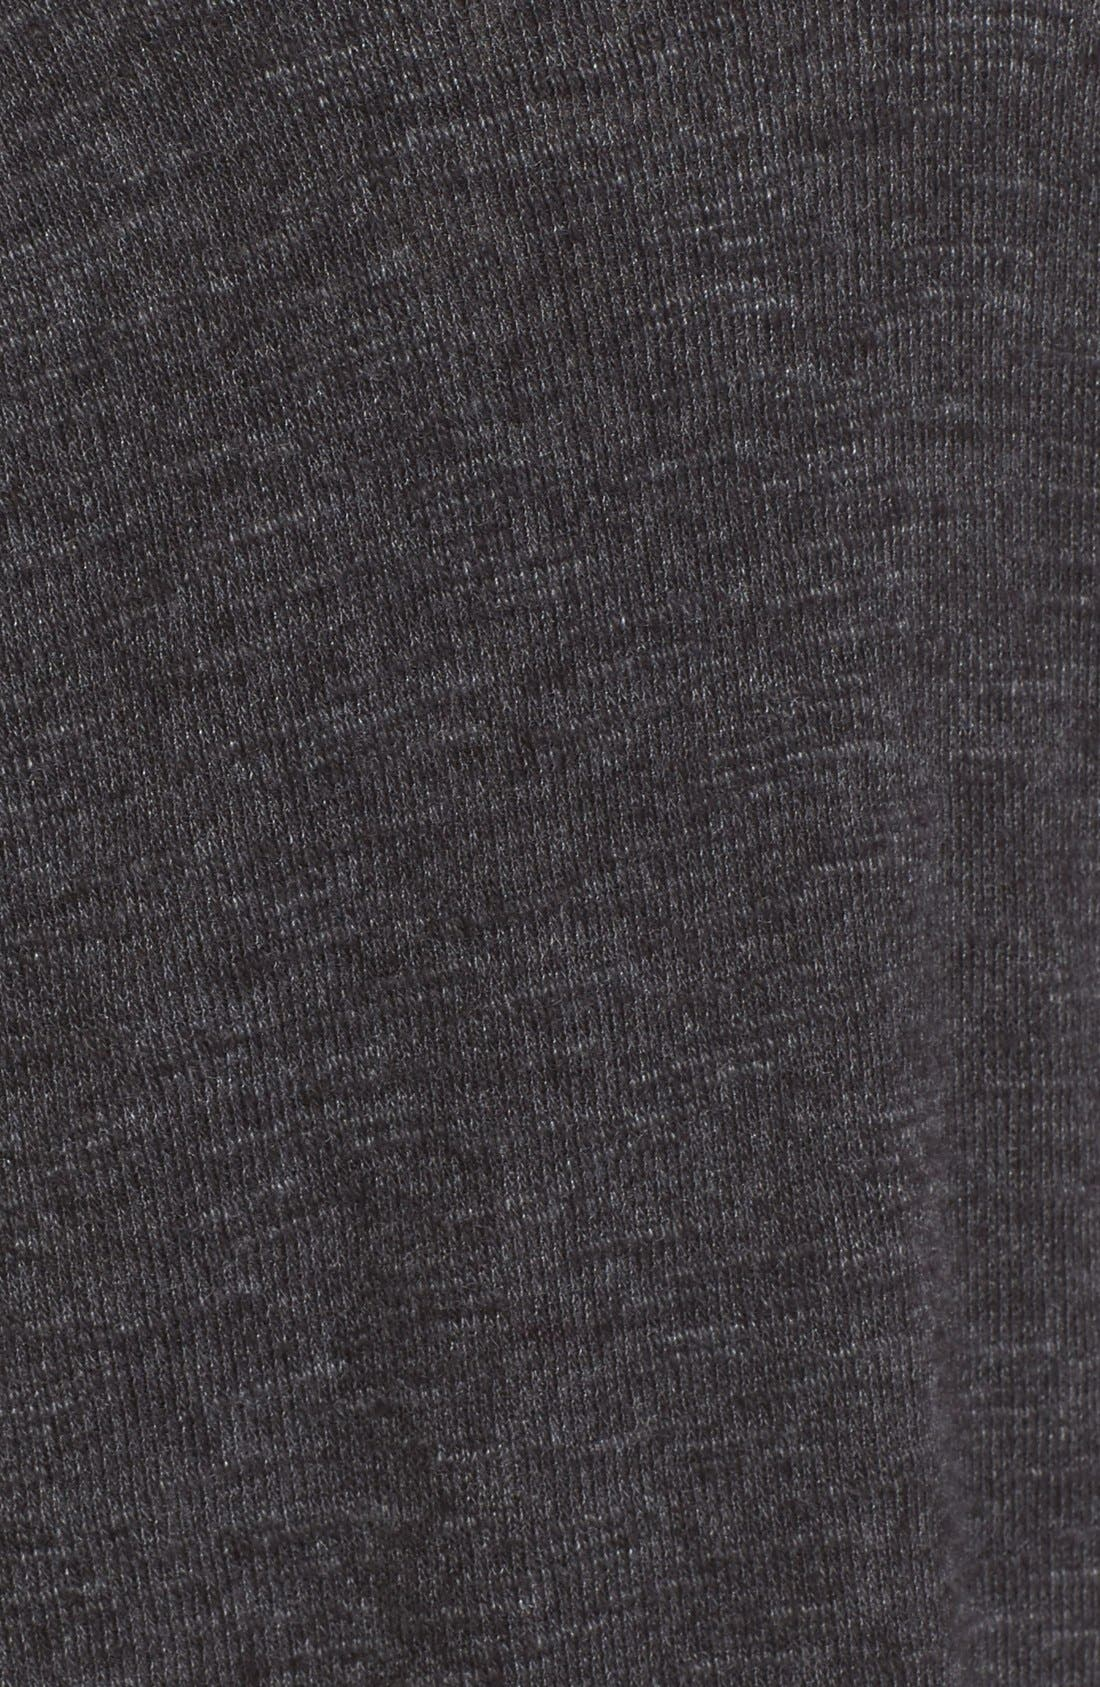 Split Back Turtleneck,                             Alternate thumbnail 5, color,                             Black